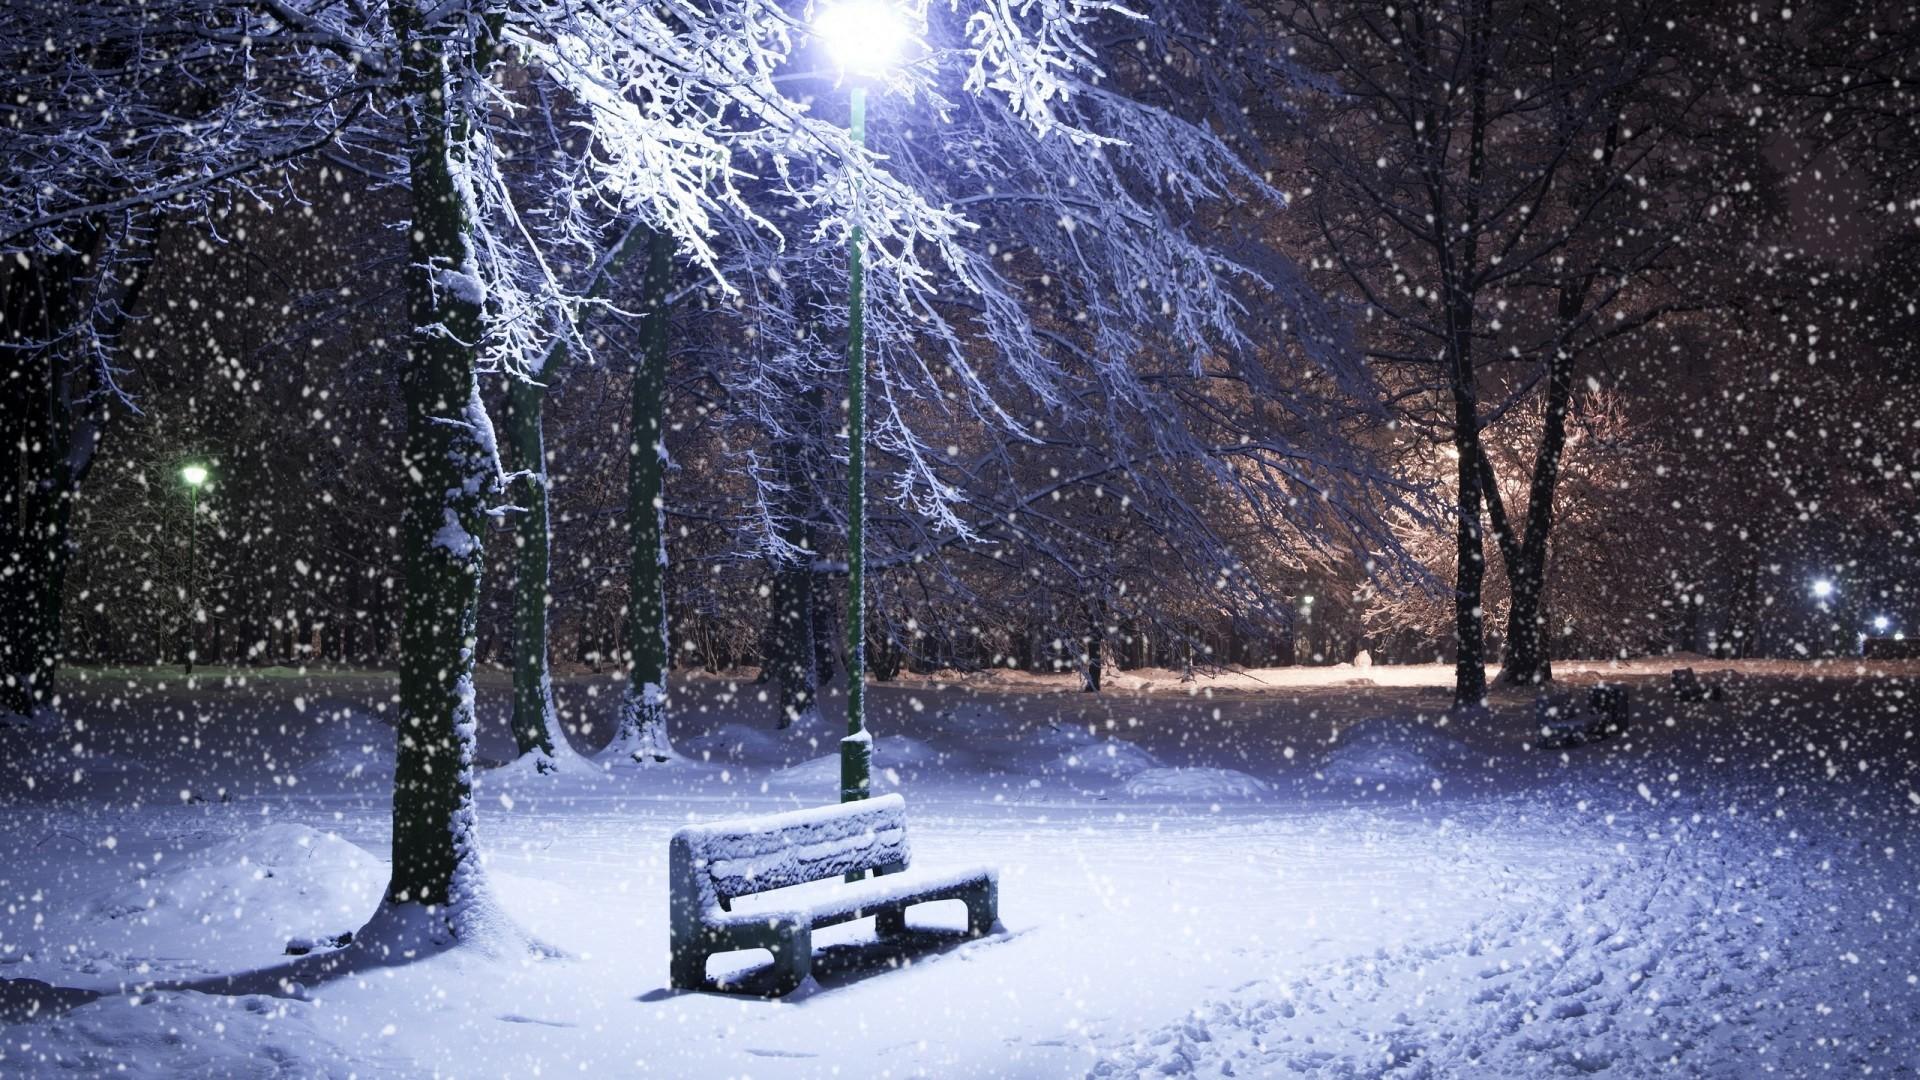 Winter Snow Desktop Wallpaper This